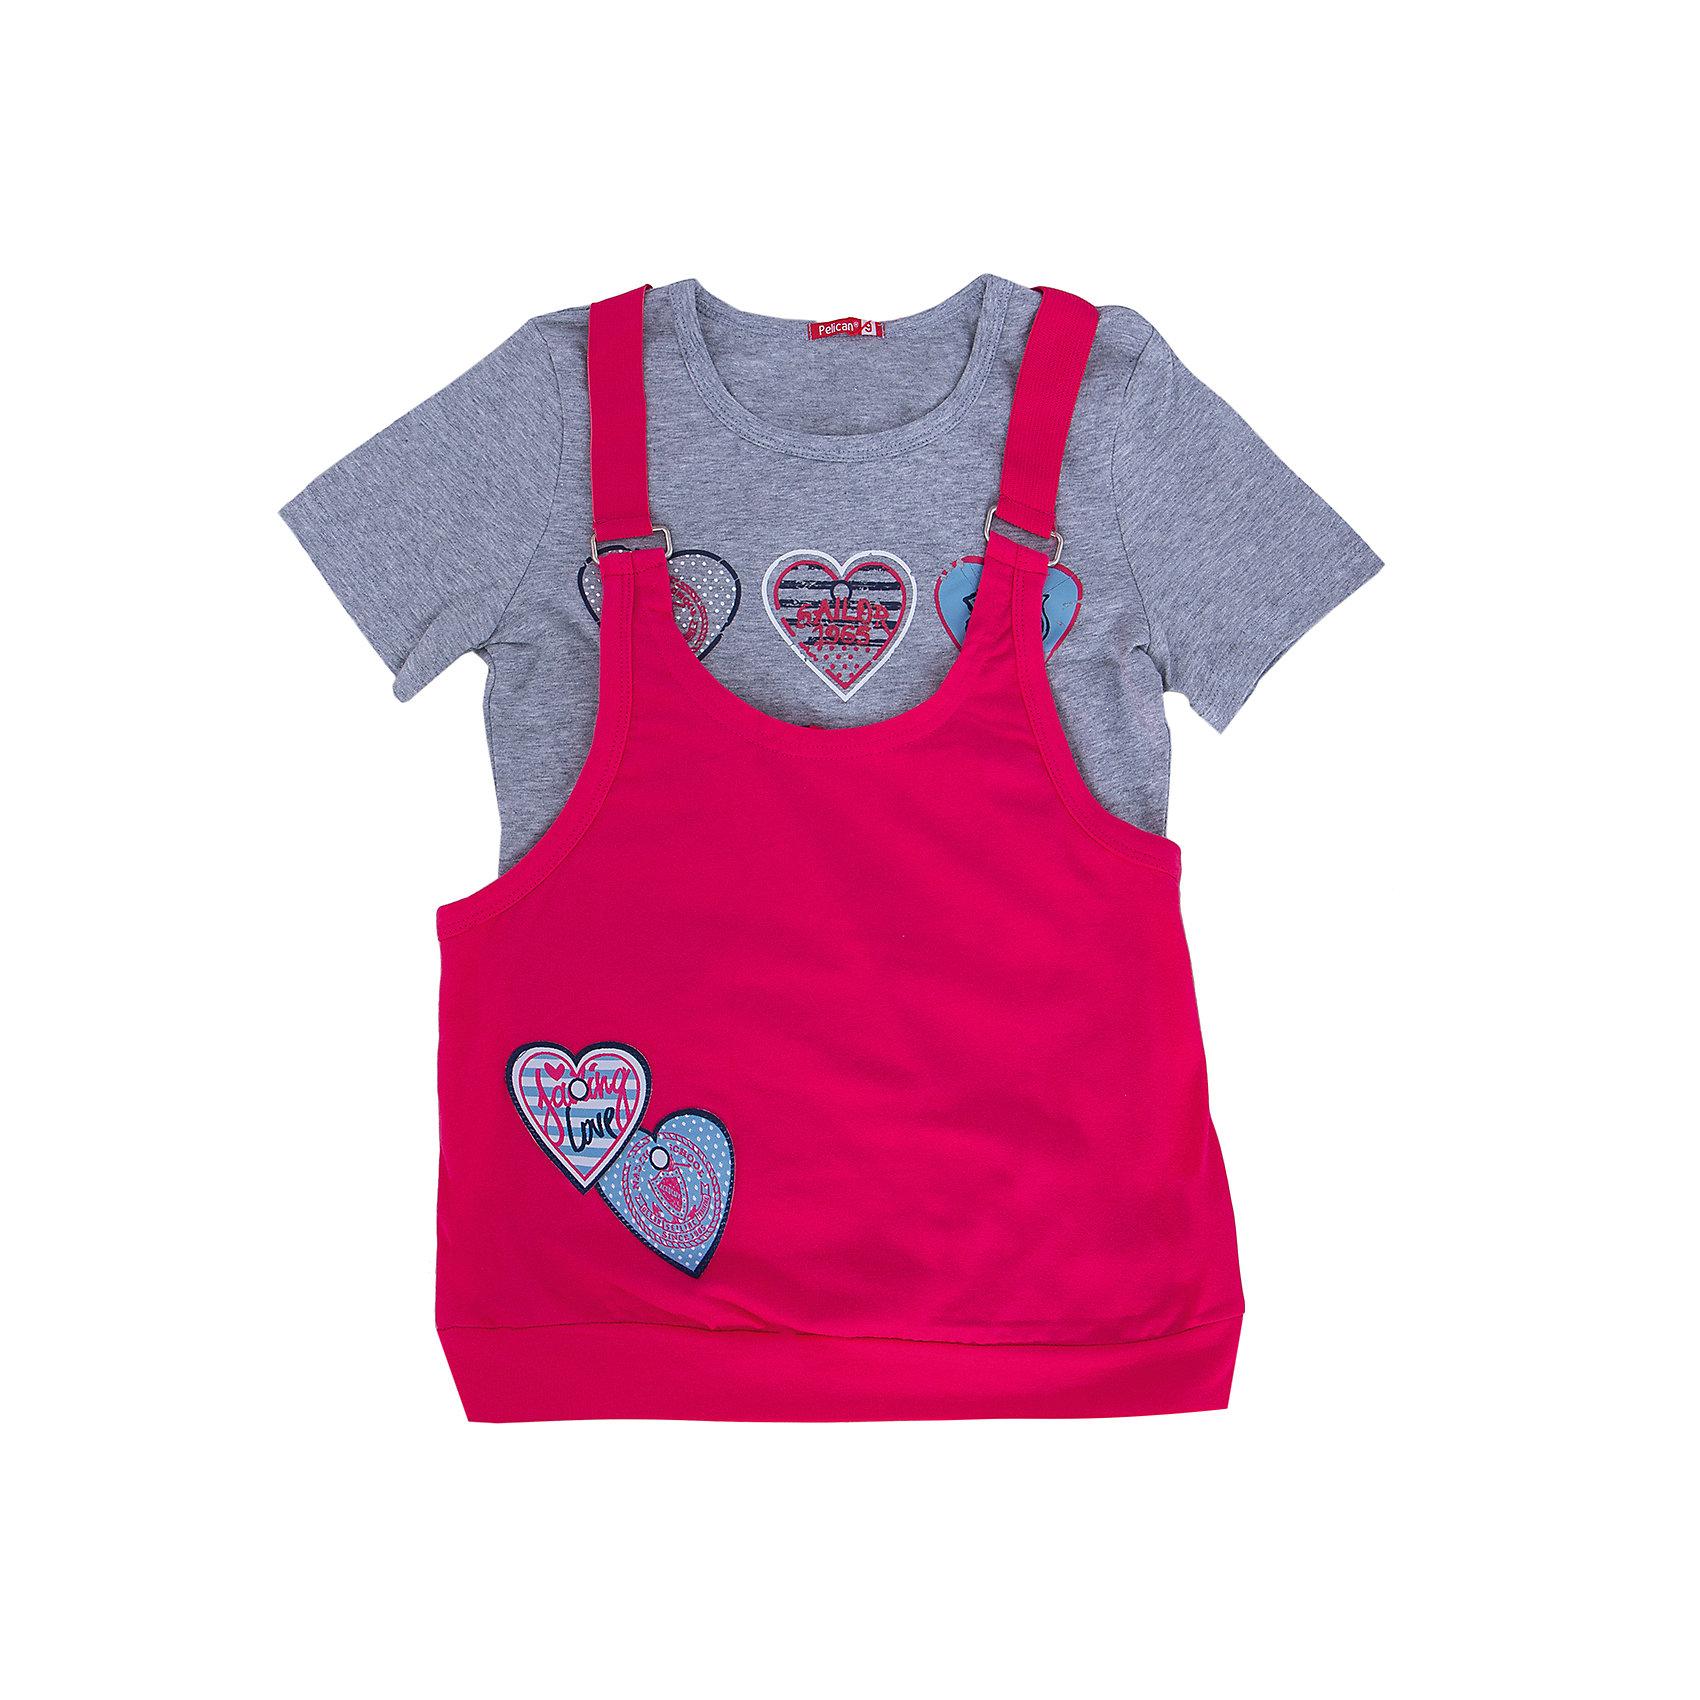 PELICAN Комплект: футболка и туника для девочки PELICAN комплекты белья pelican комплект href